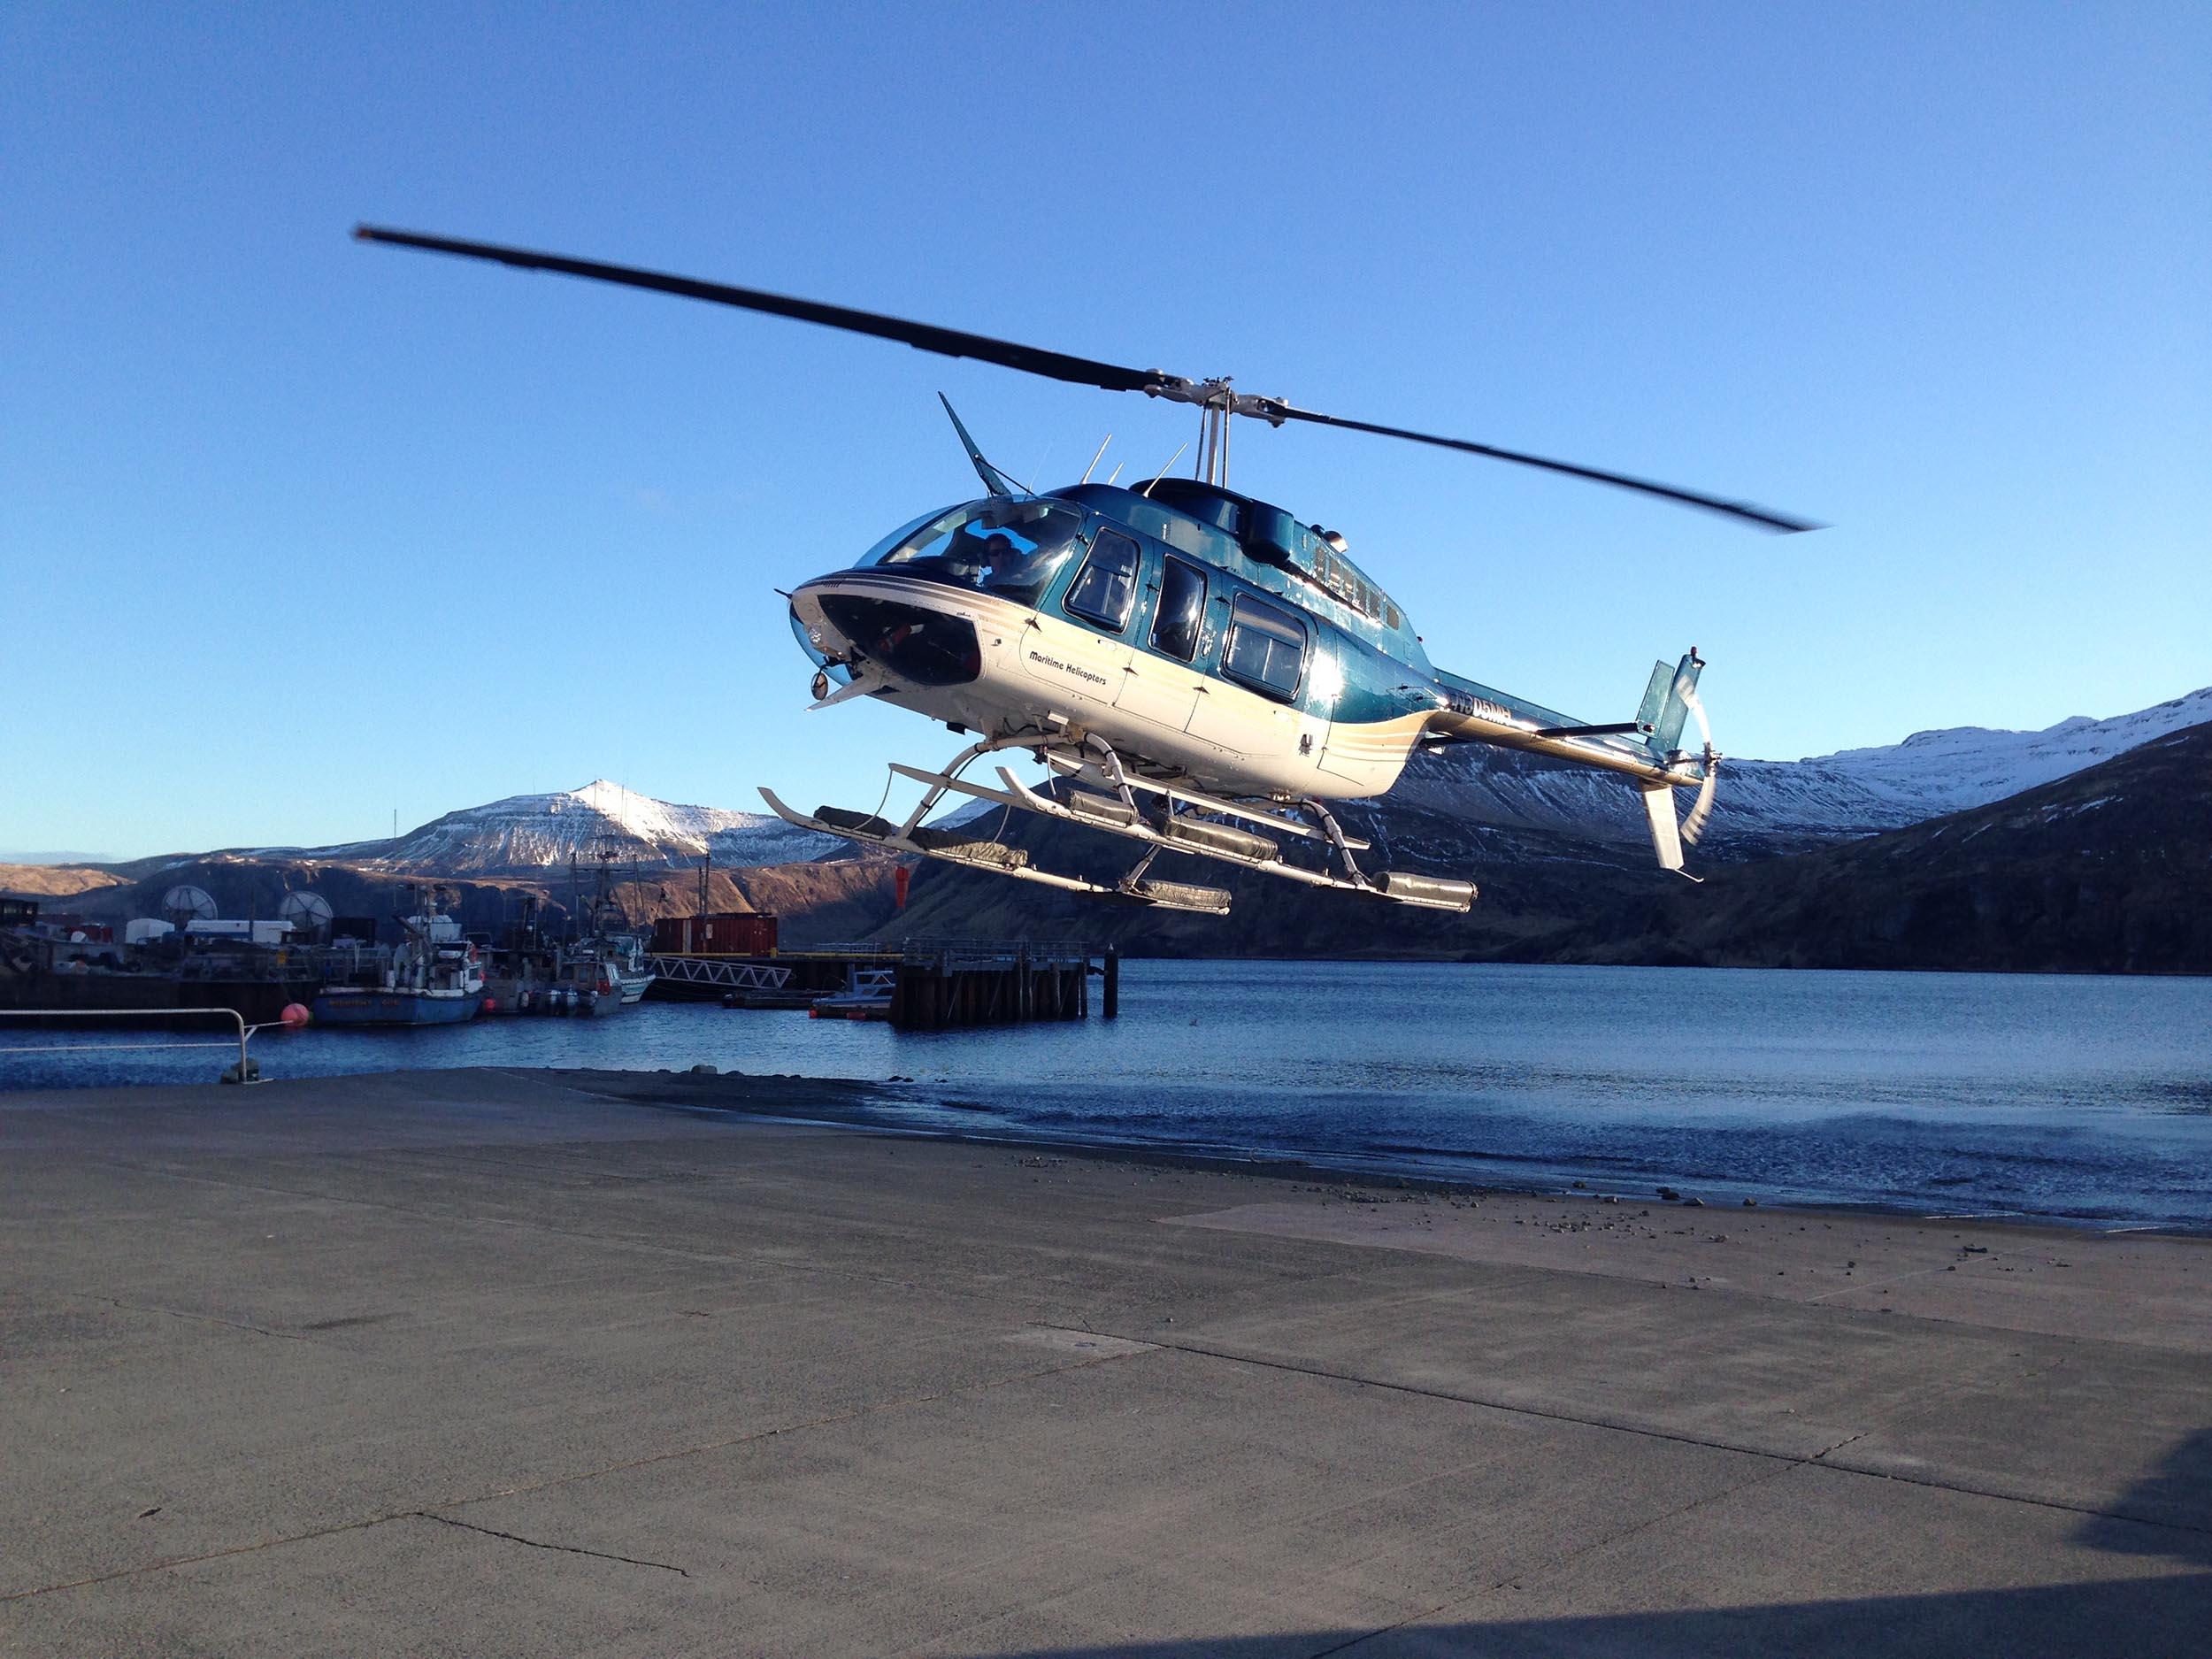 Bell 206 L4